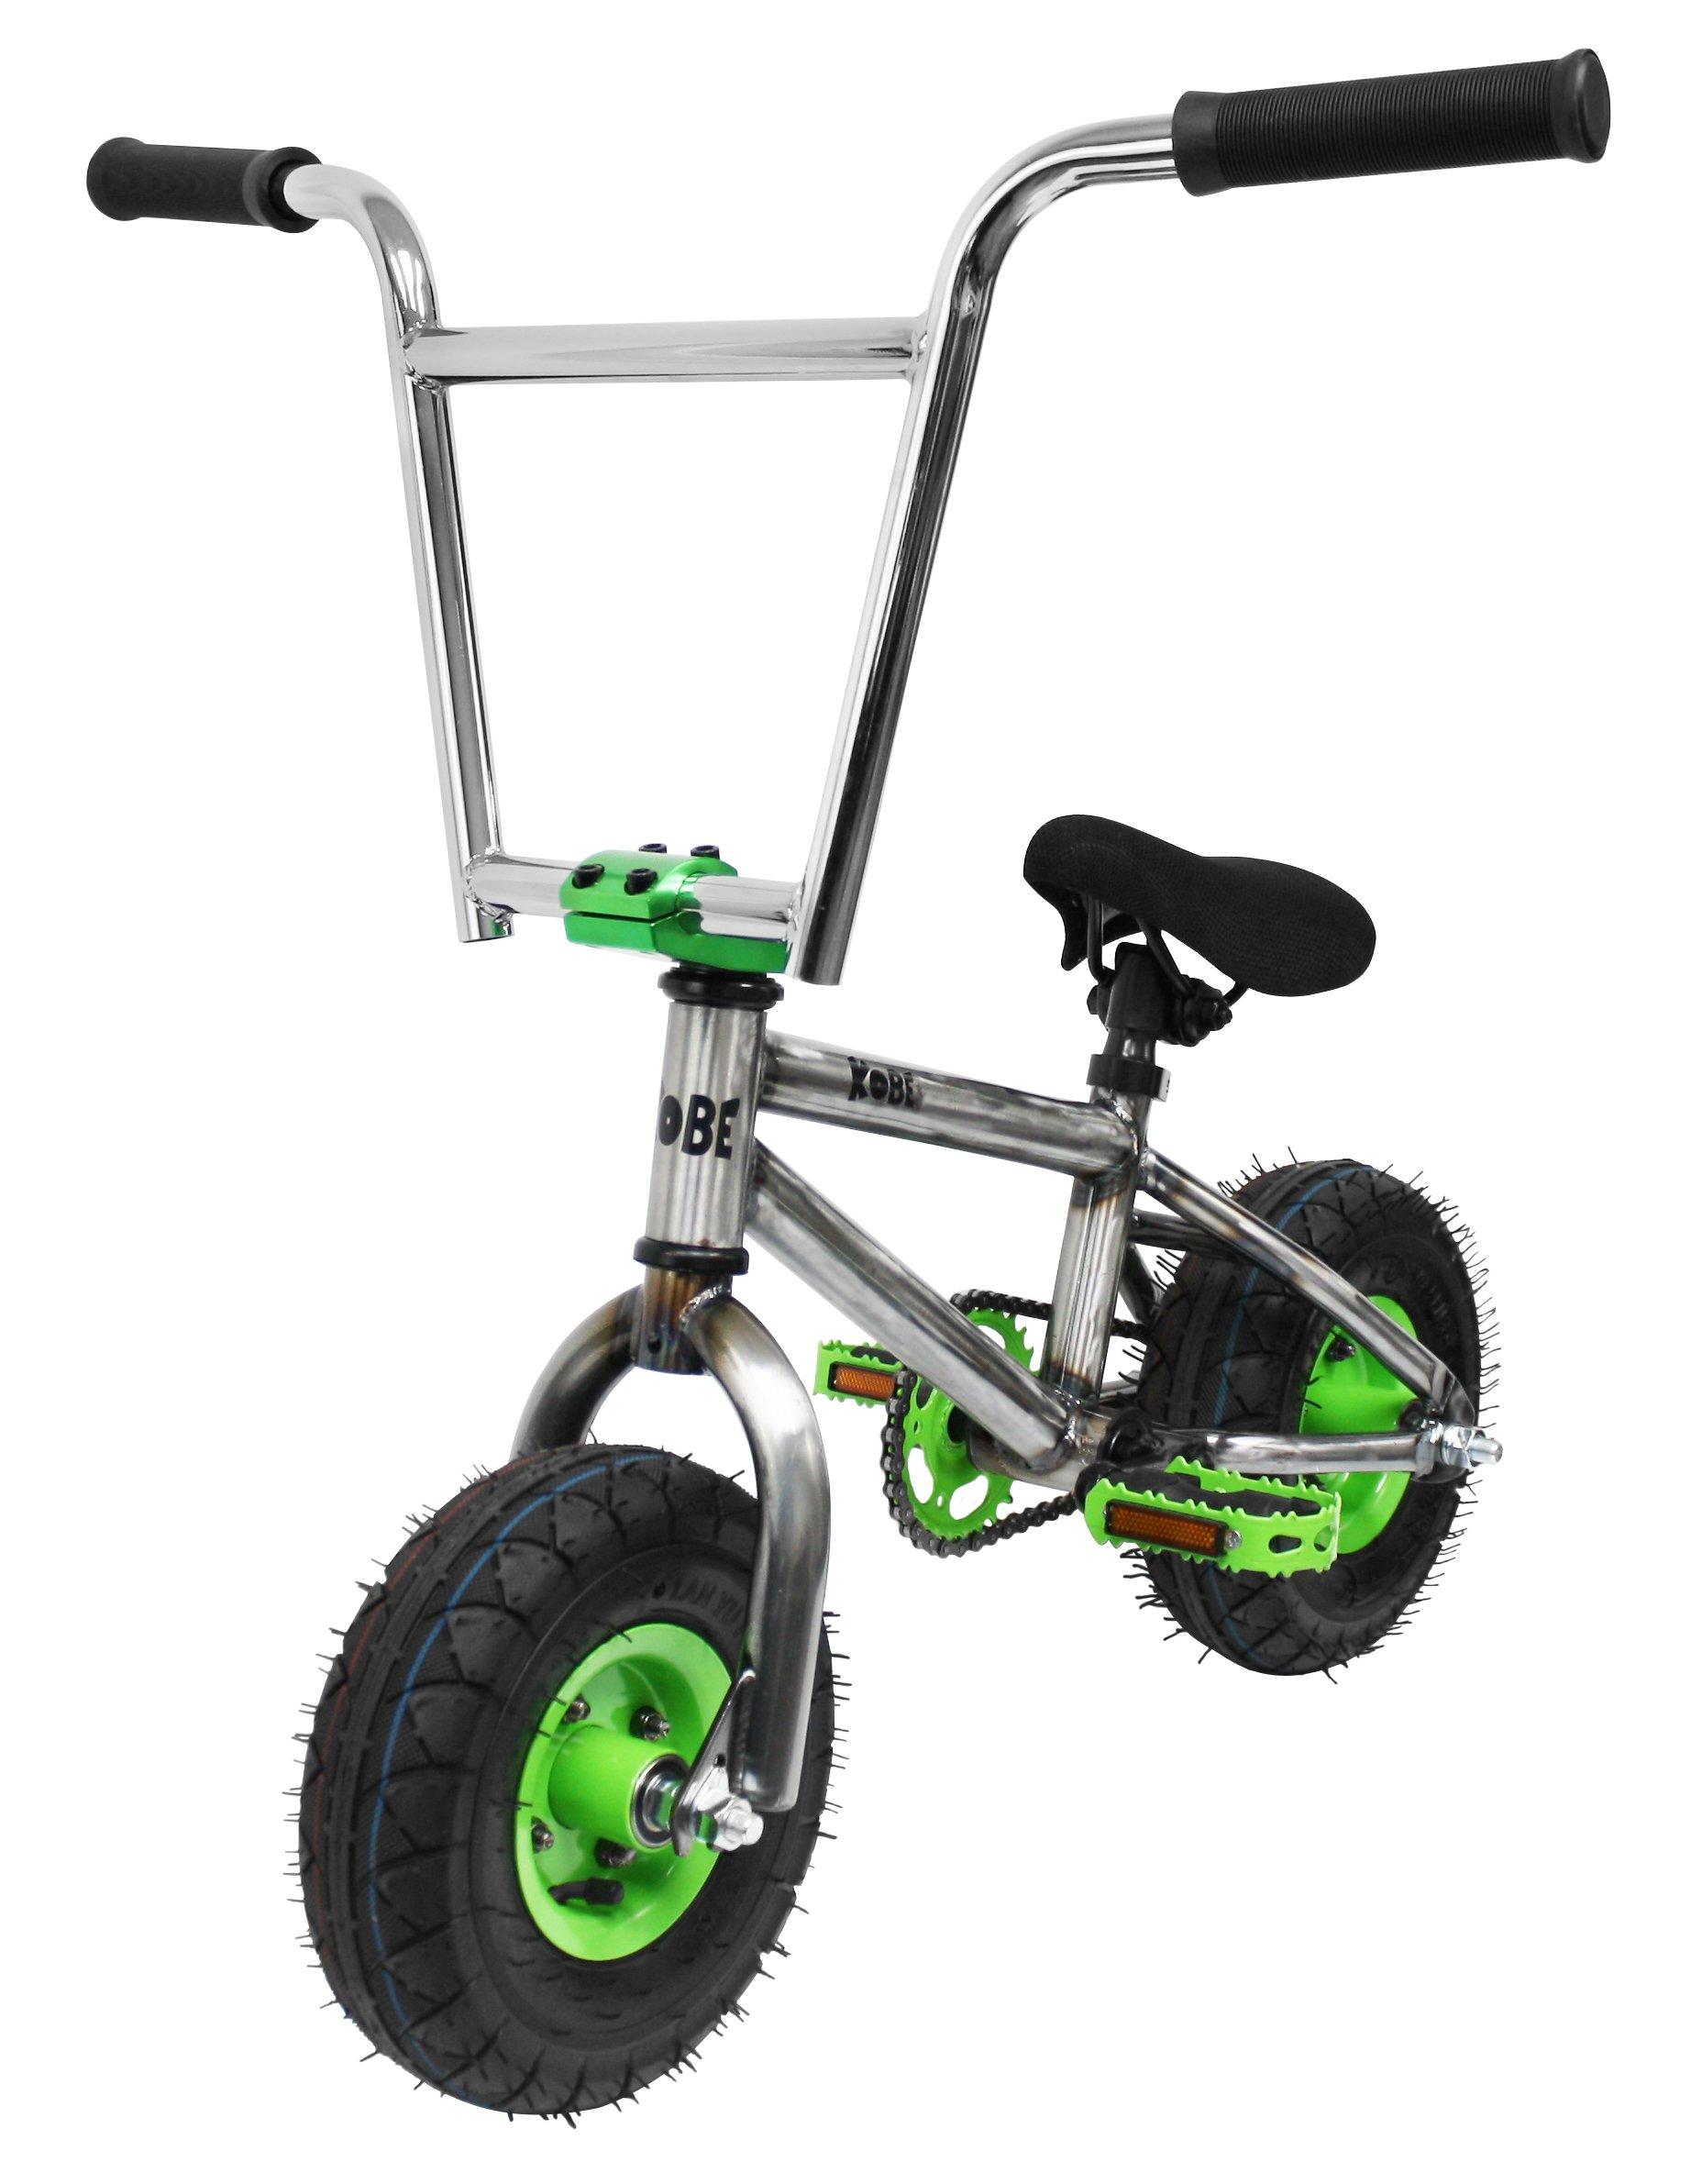 Kobe ''Rusty Rat Rod'' Mini BMX - Raw + Green - Freestyle, Trick, Stunt Bicycle 10'' Wheels